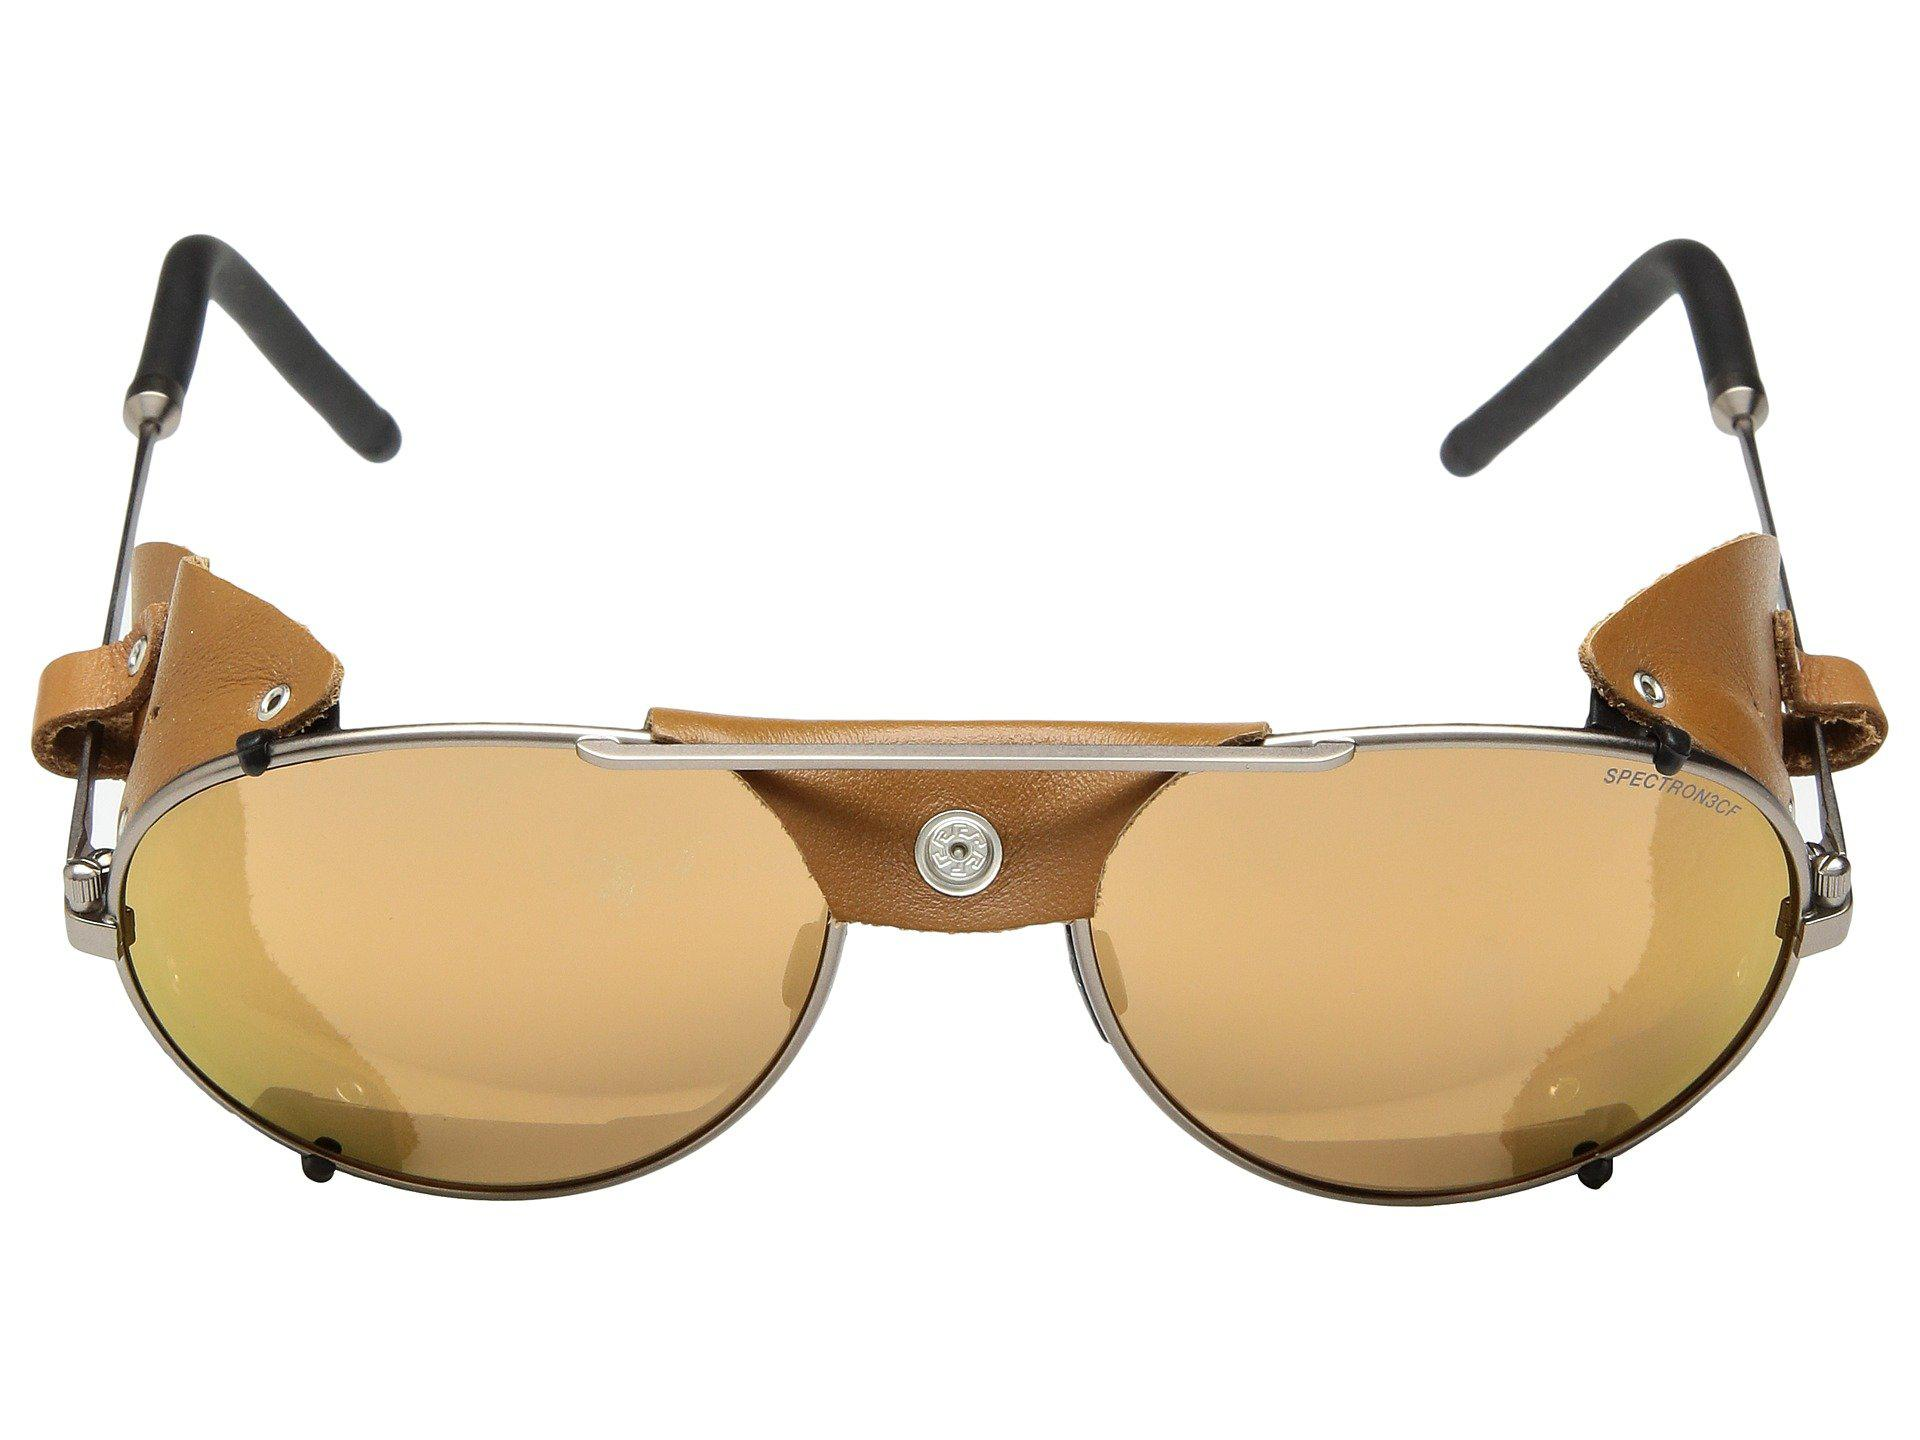 2063c3dc592 Lyst - Julbo Eyewear Cham (brass brown) Athletic Performance Sport ...